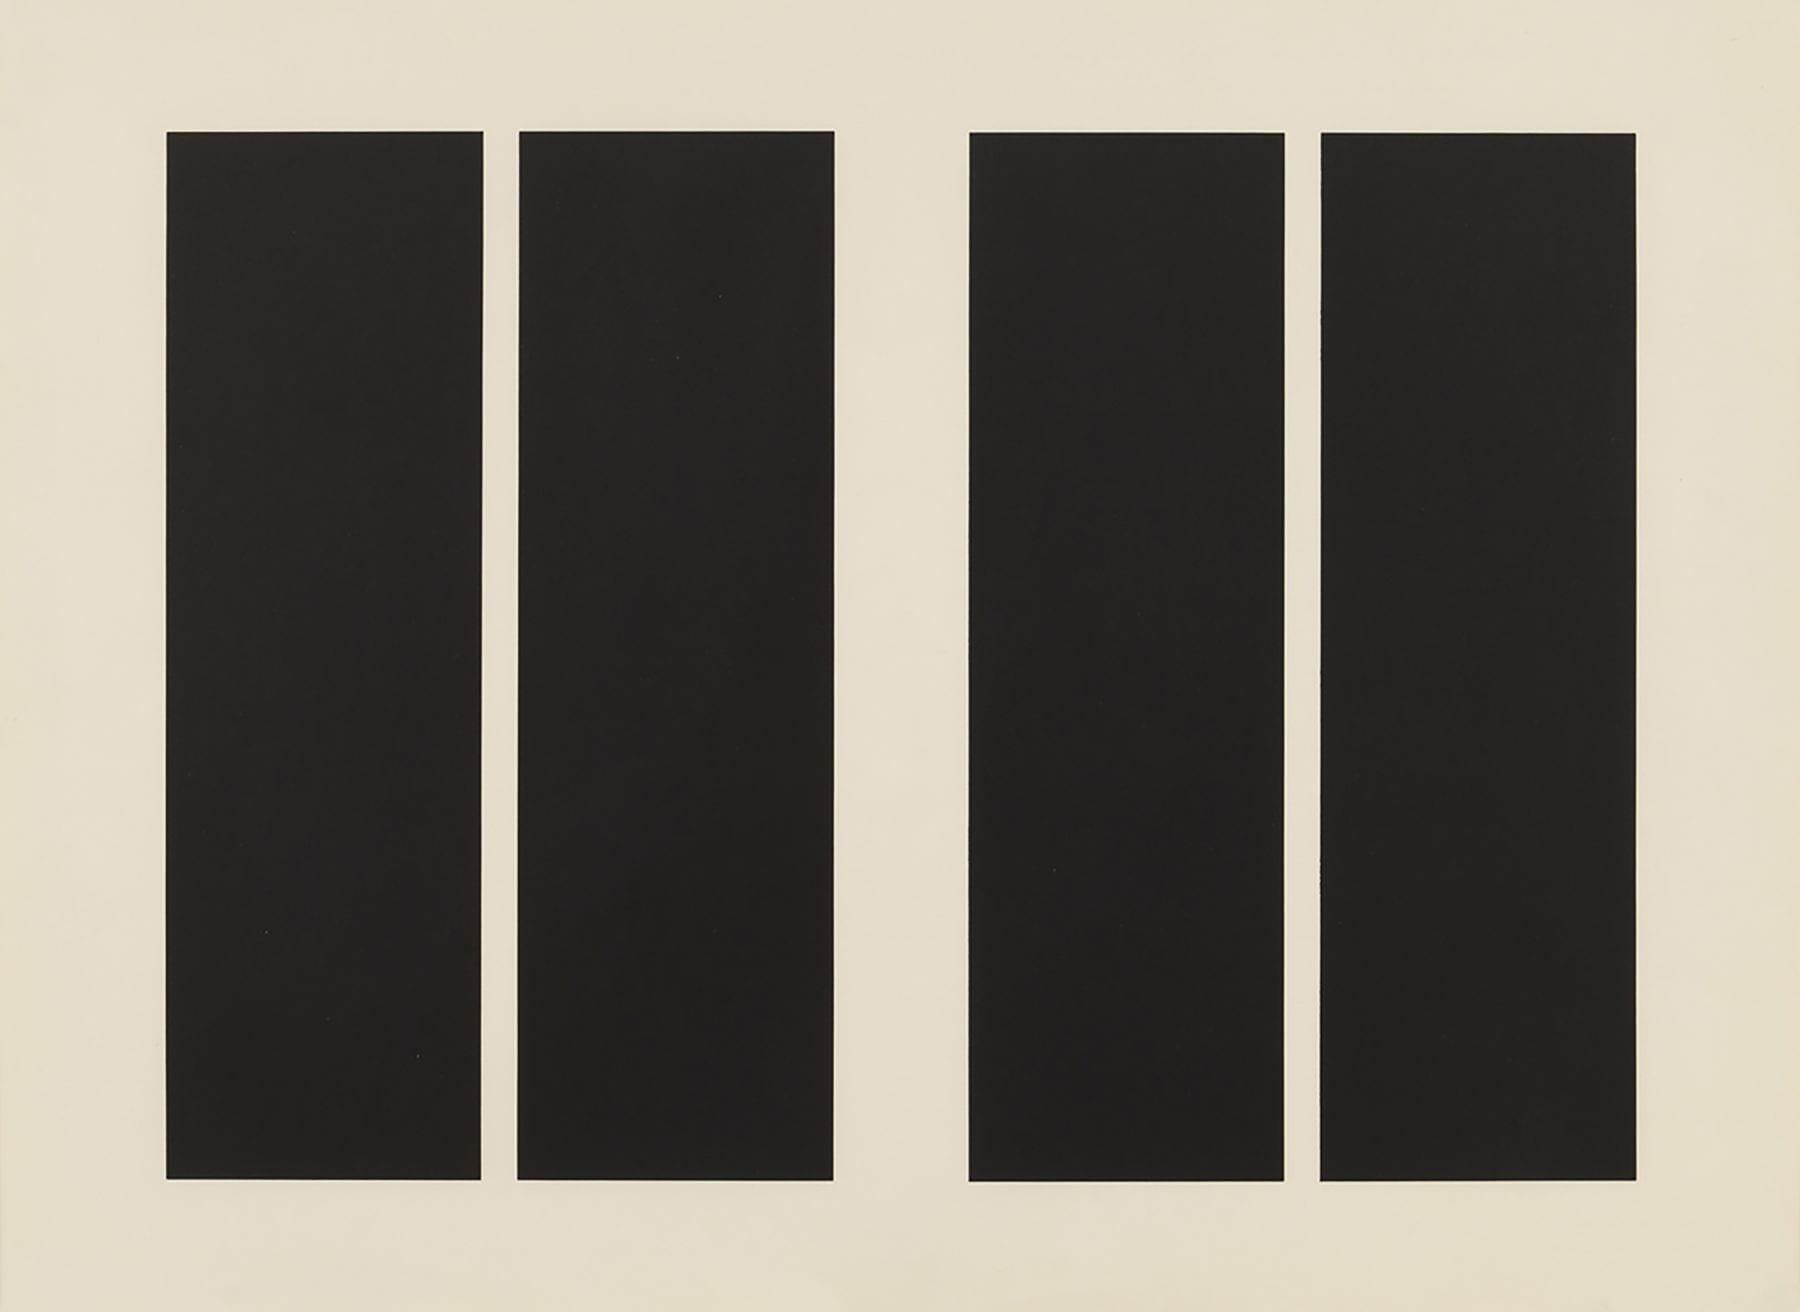 Untitled, 1963 Medium: Lithograph